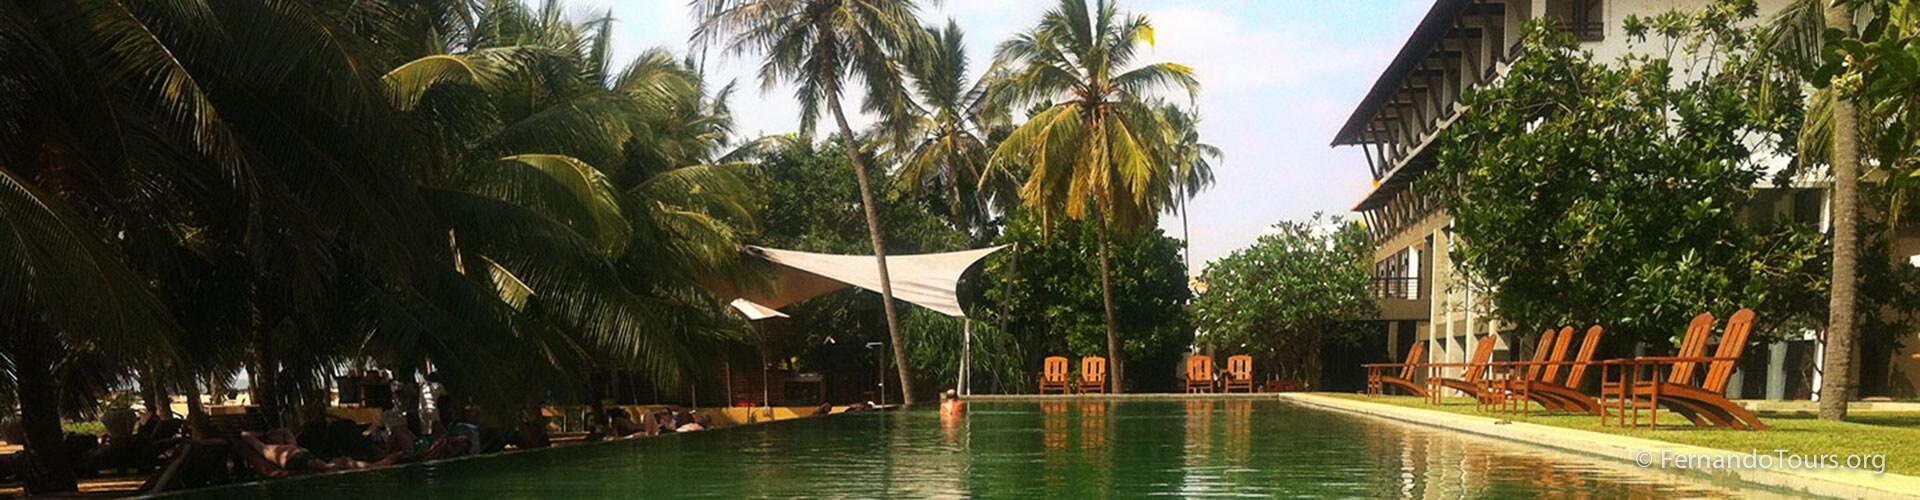 Sri Lanka Negombo hotel